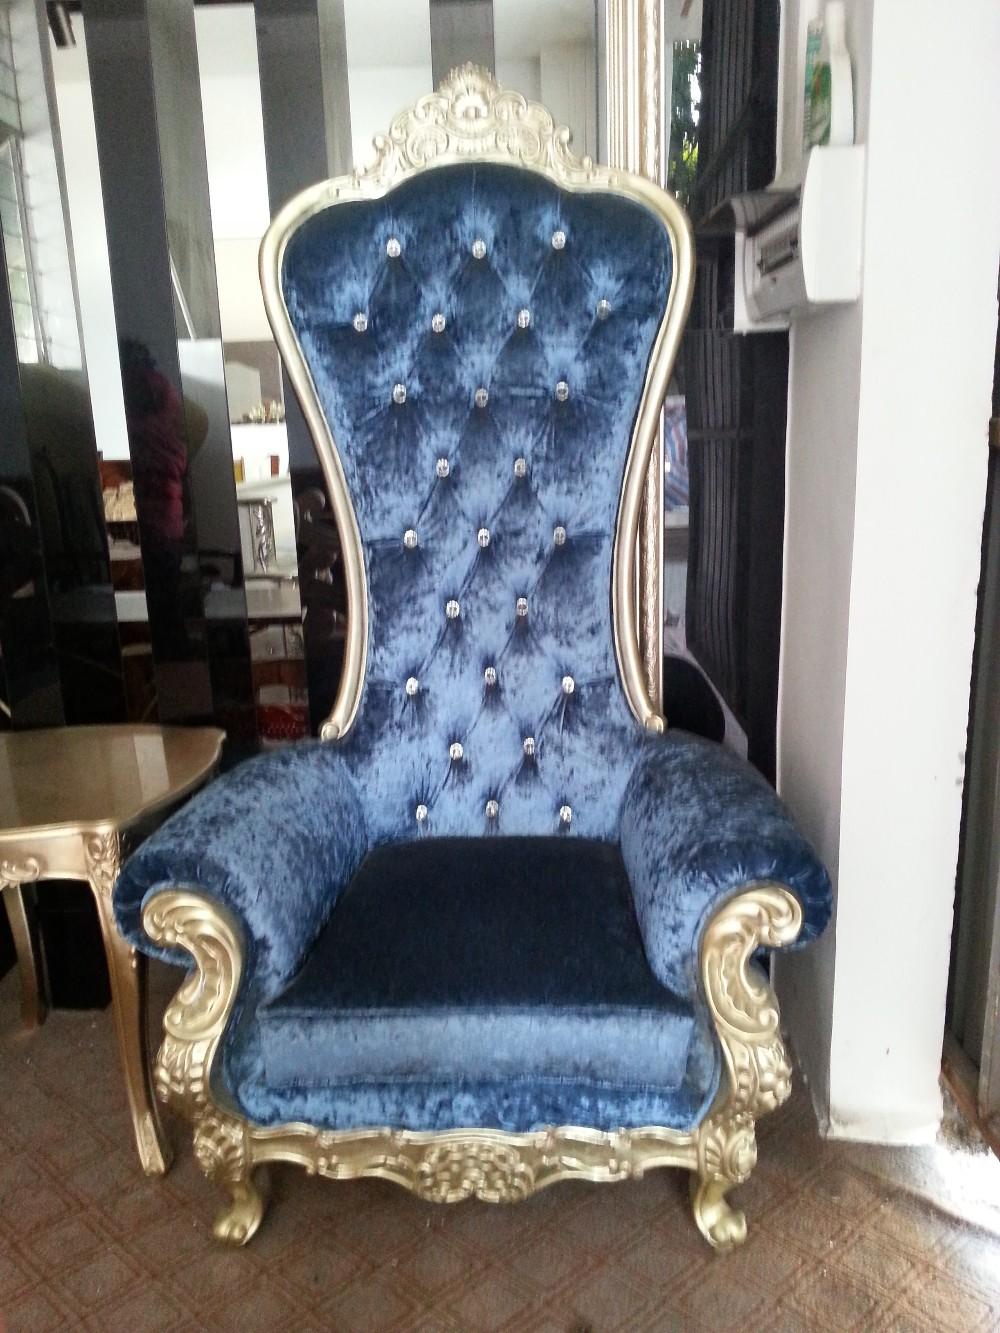 Extrêmement Le Roi Chaise Trône Chaises Alice Chaises - Buy Product on Alibaba.com KG15